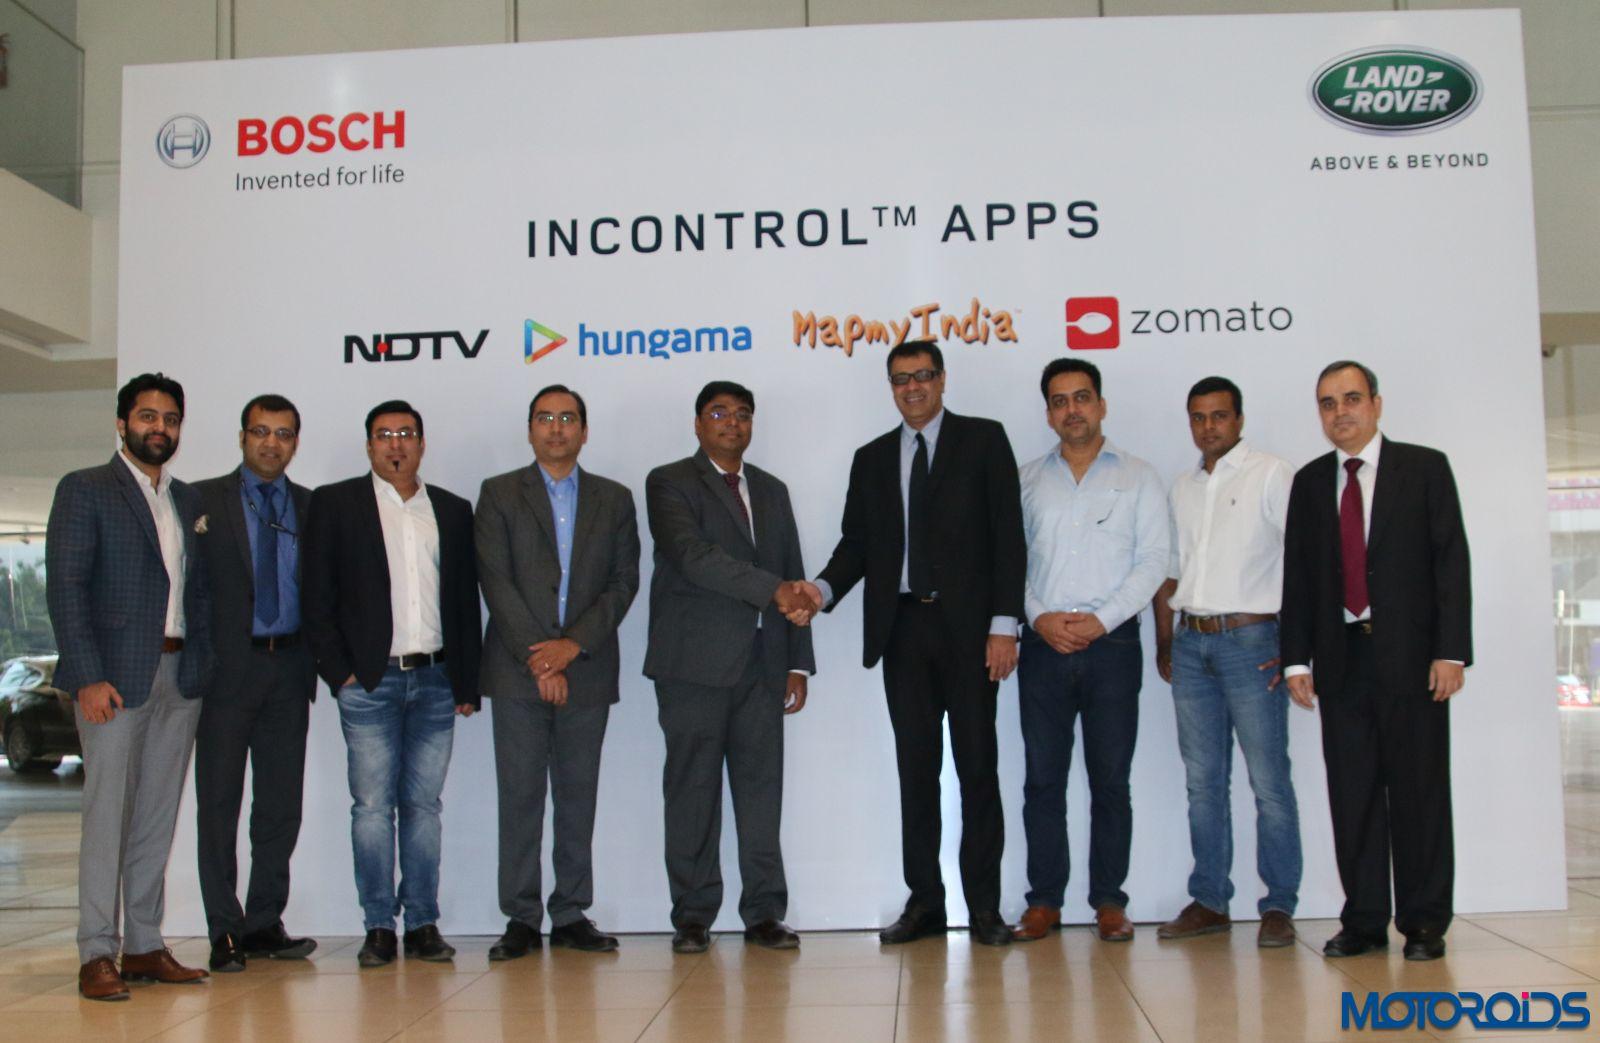 Jaguar Land Rover India Announces Incontrol Apps%2c An Innovative New Smartphone Integration Platform